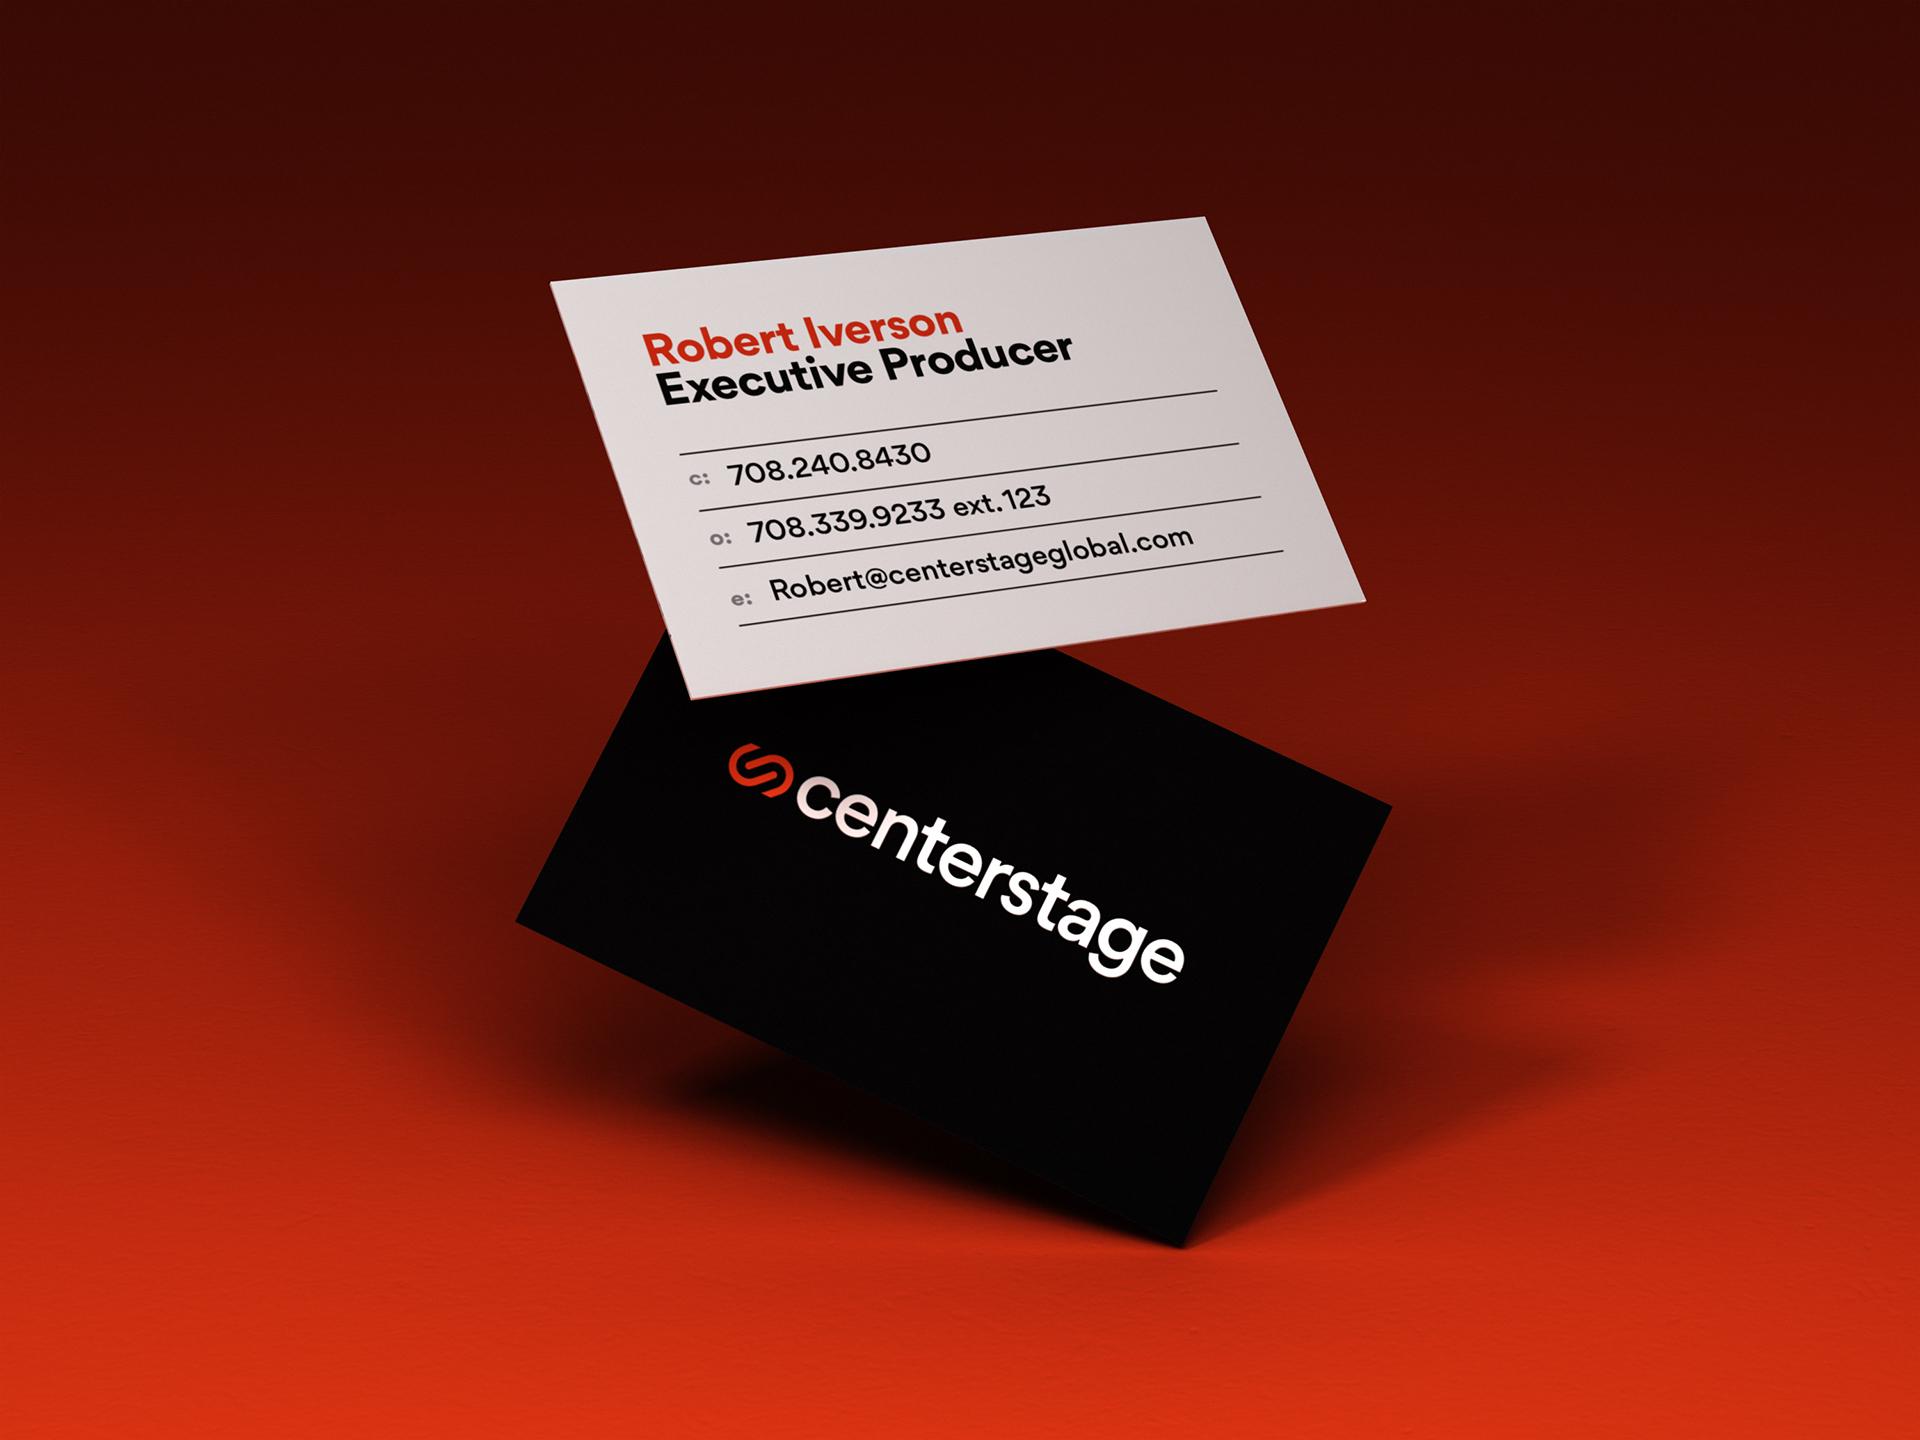 Centerstage business cards